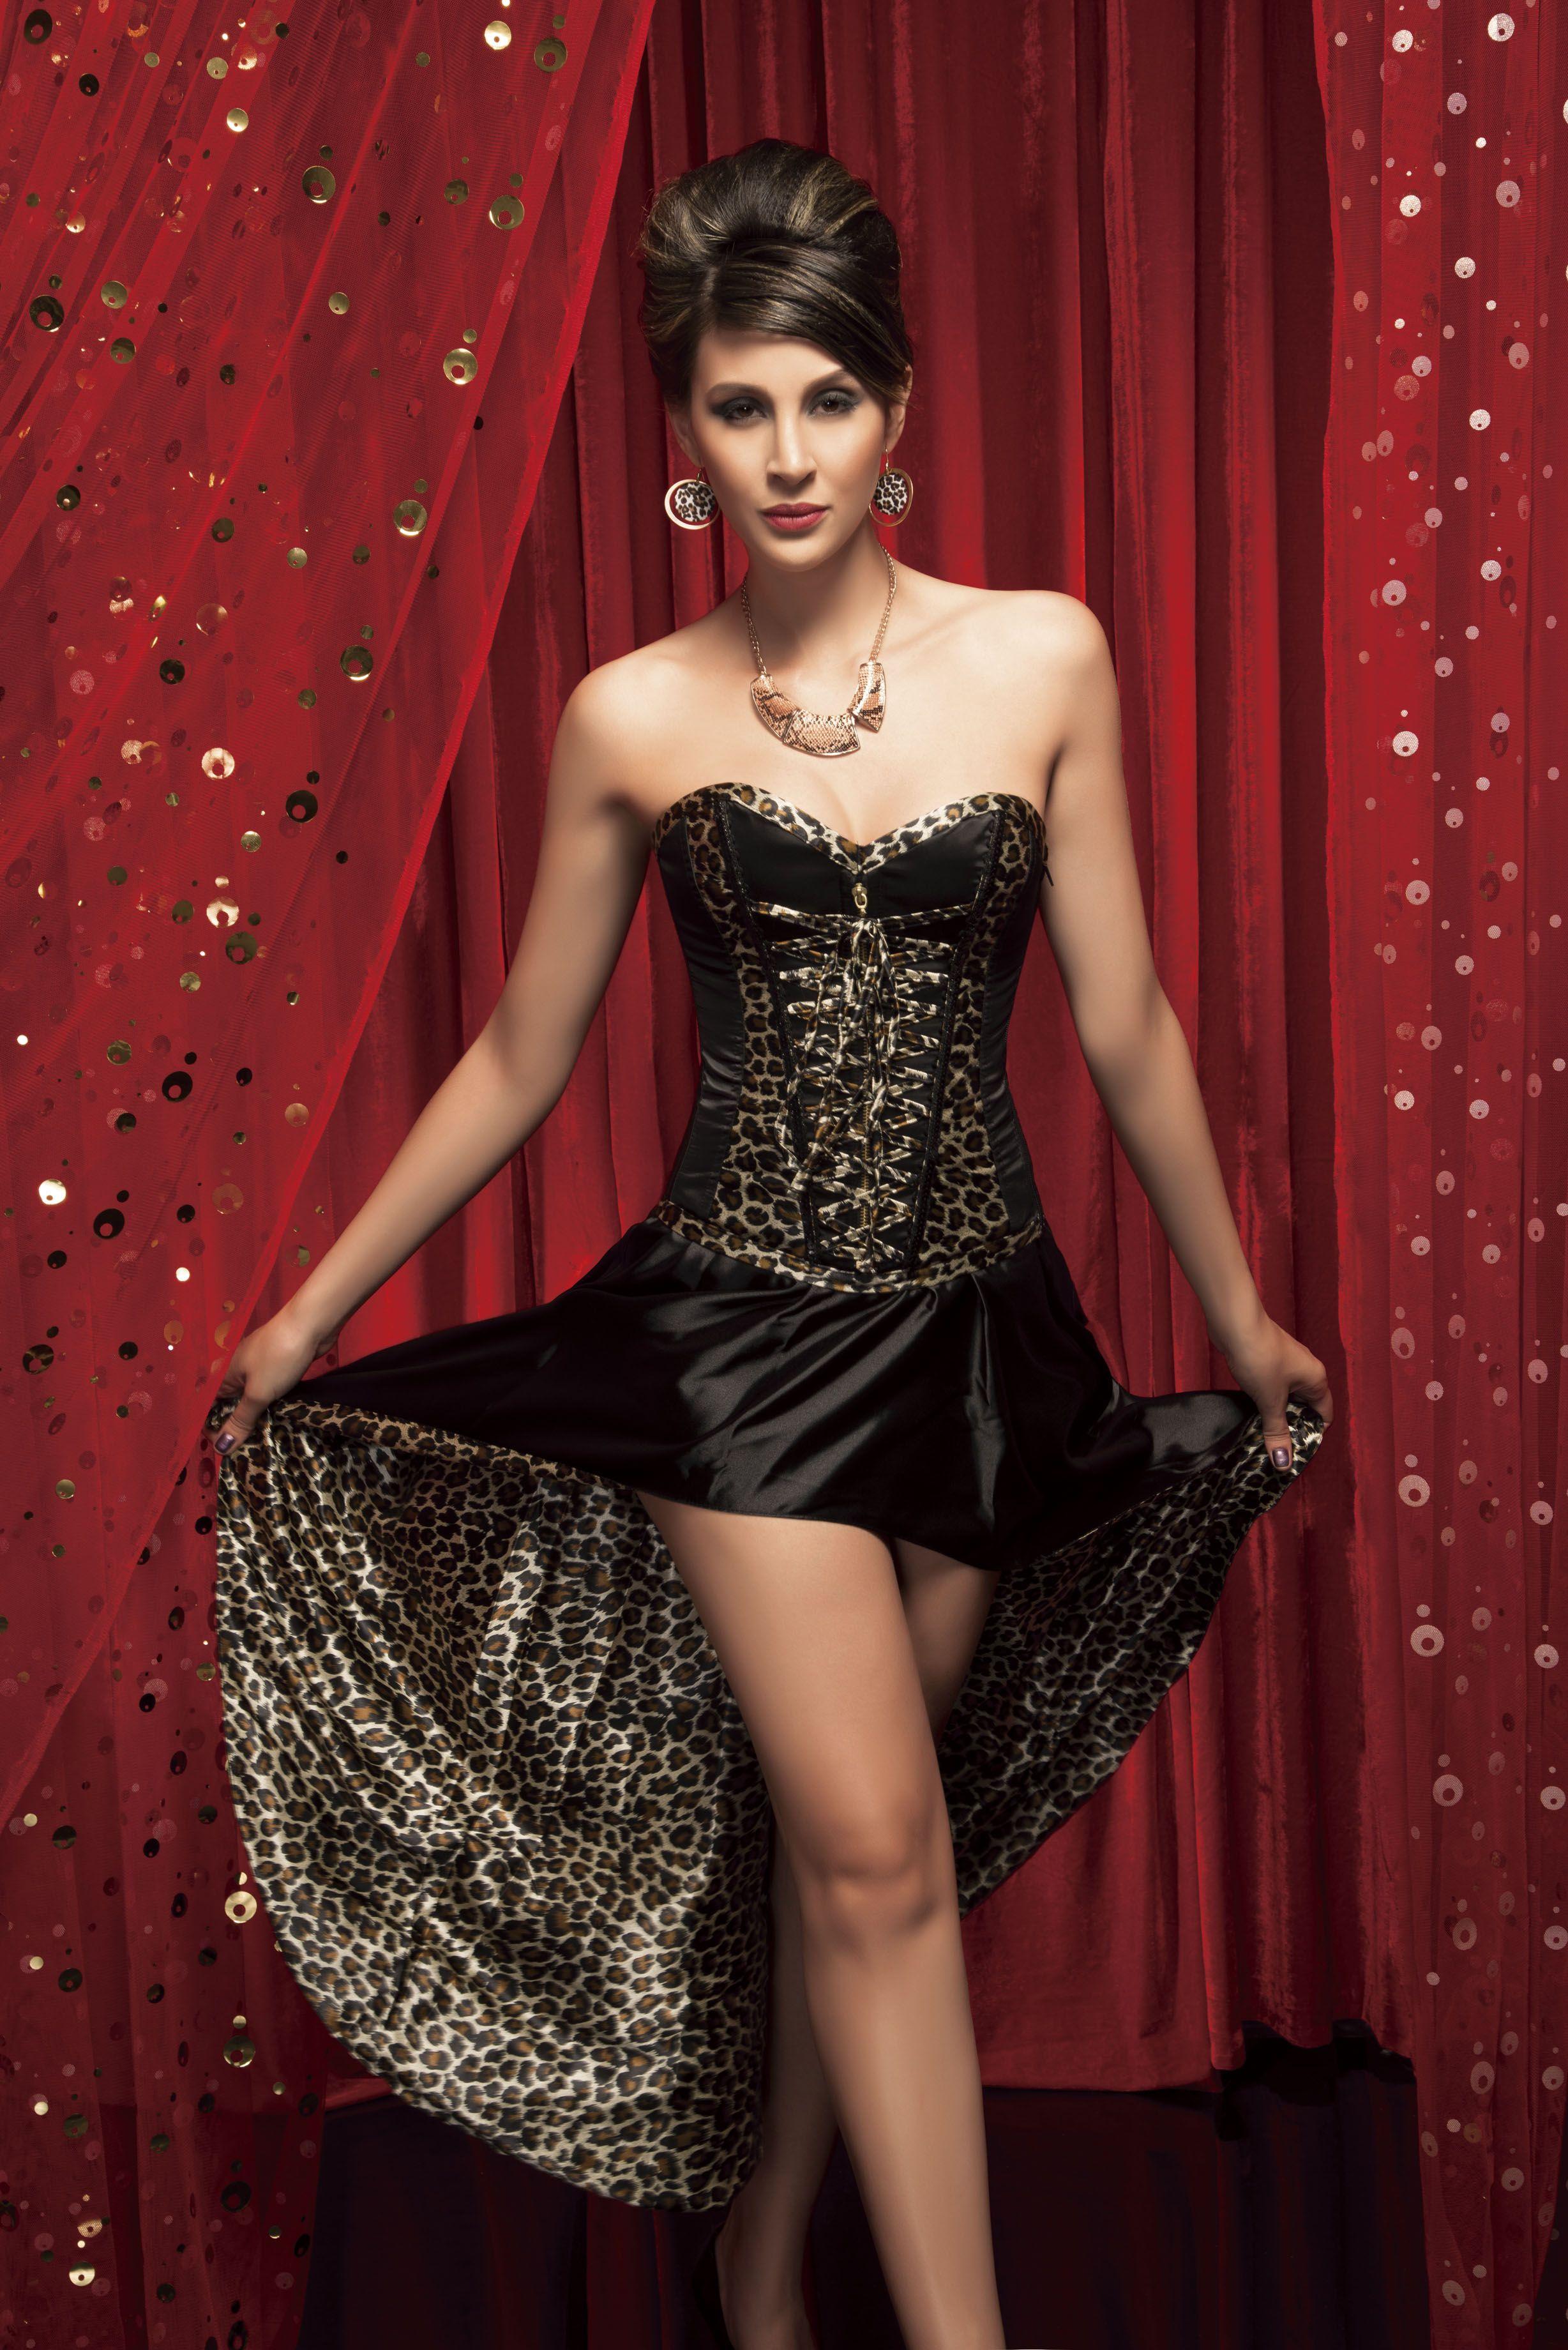 http://www.showfashiongirl.com/moulin-rouge-burlesque-leopard-vegas ...